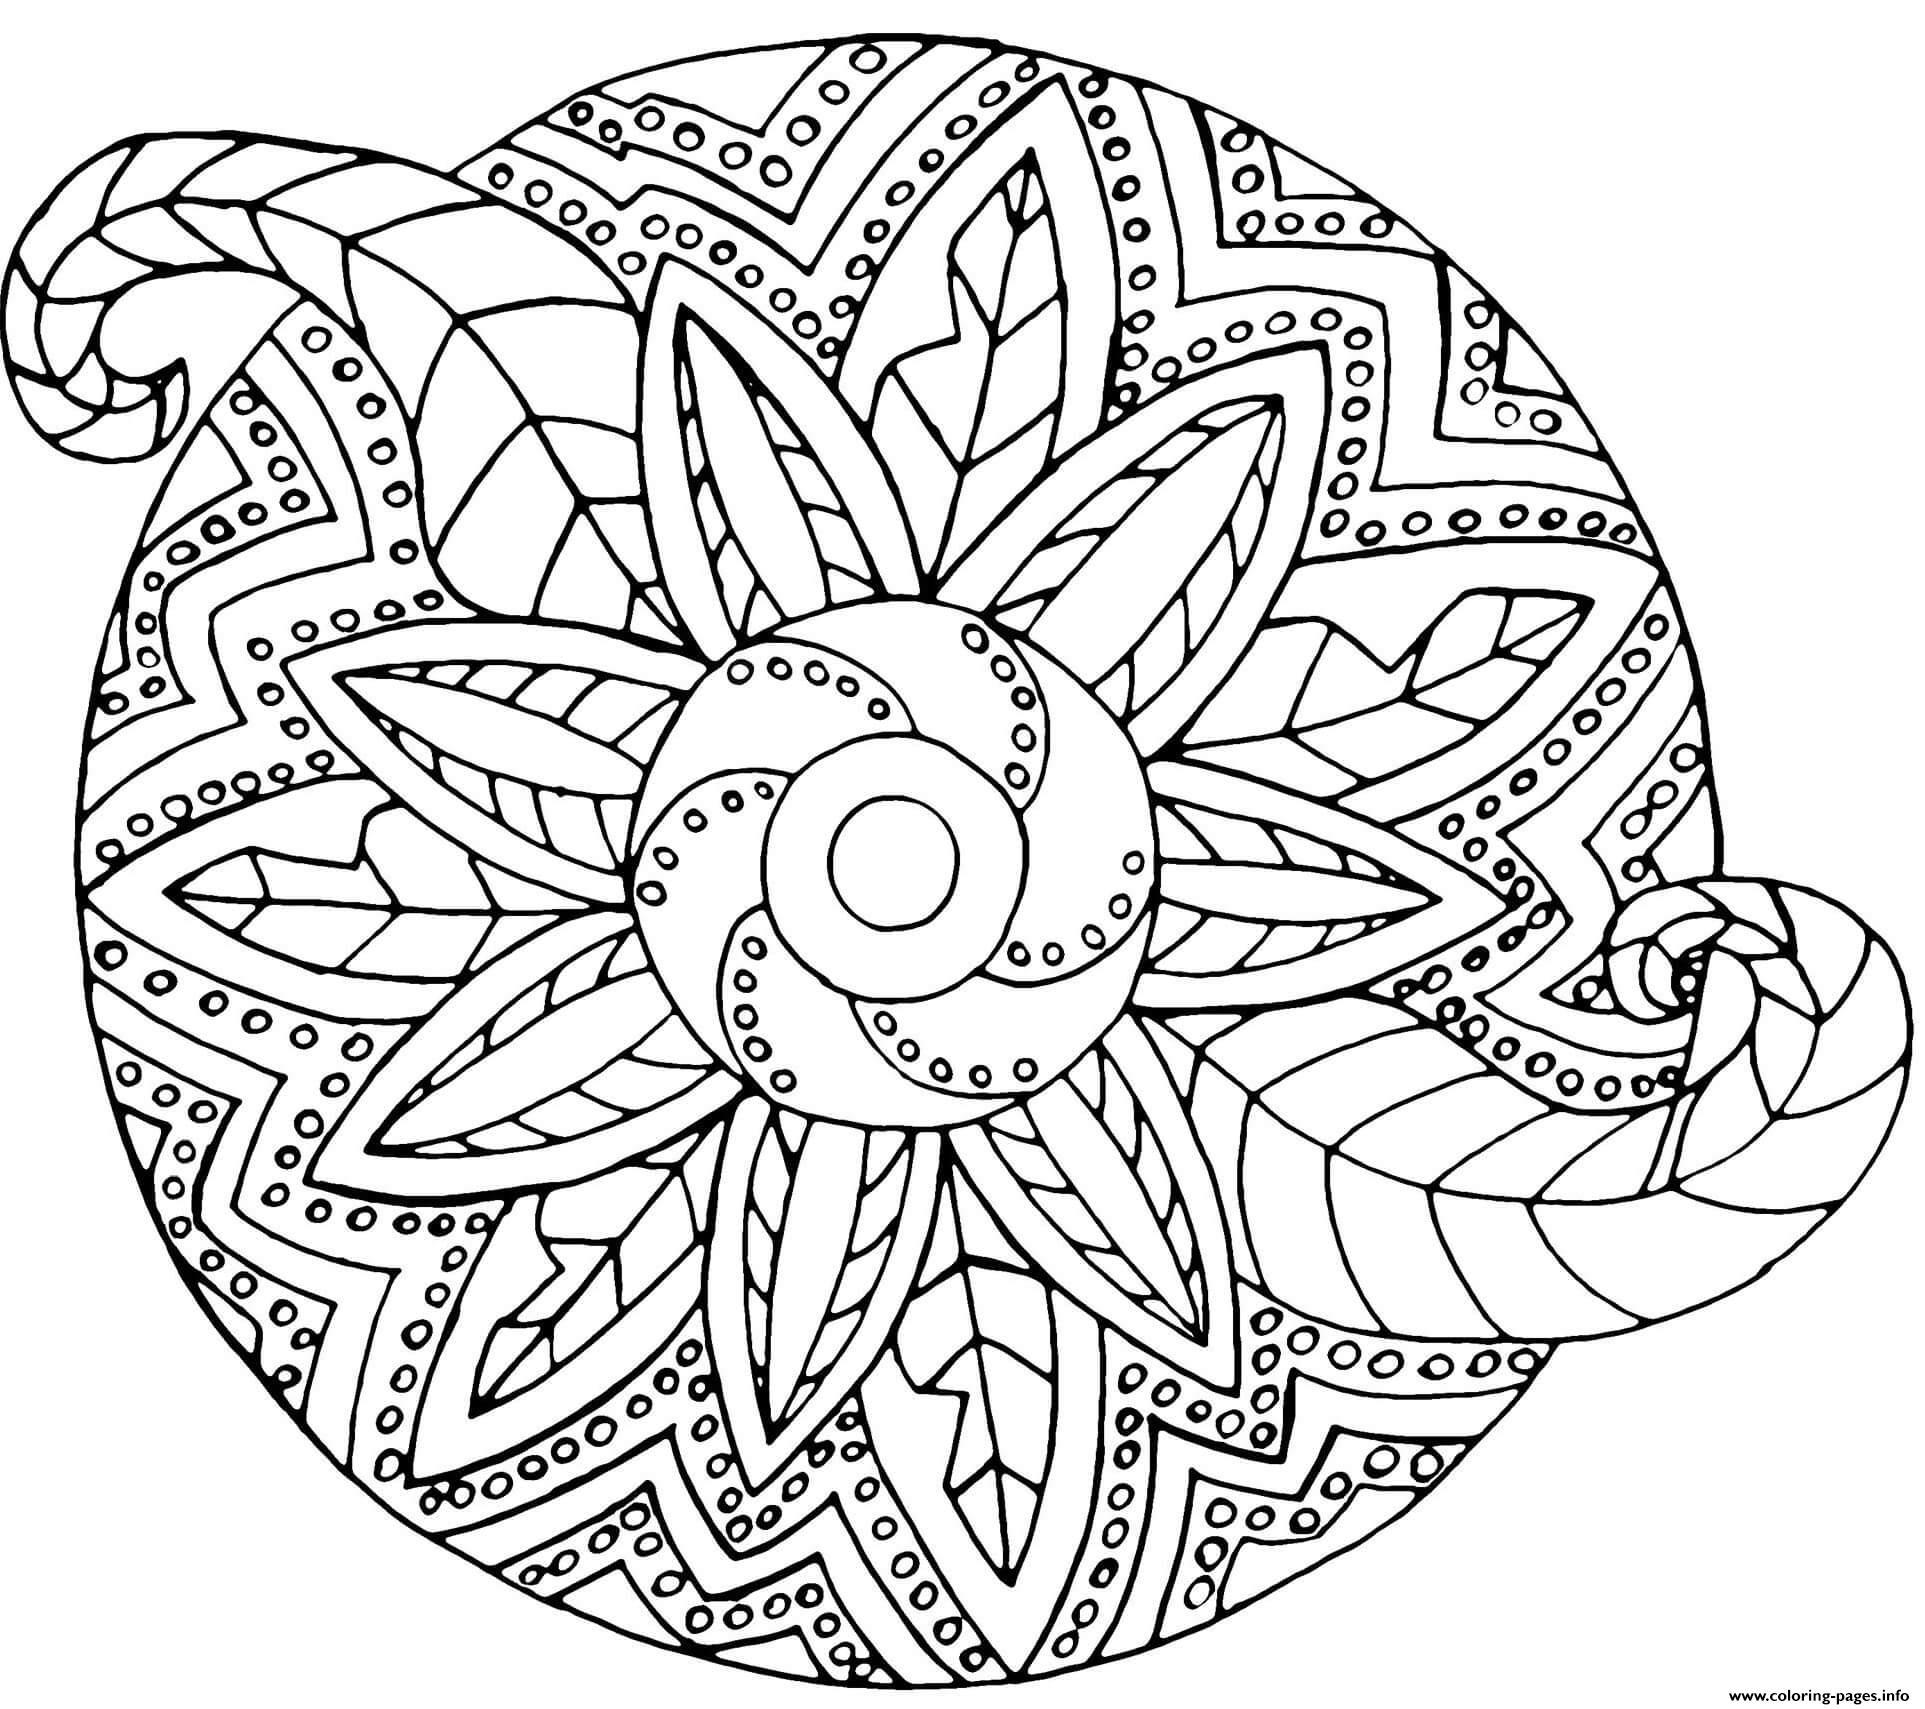 Mandala Zentangle Vegetal Coloring Pages Printable